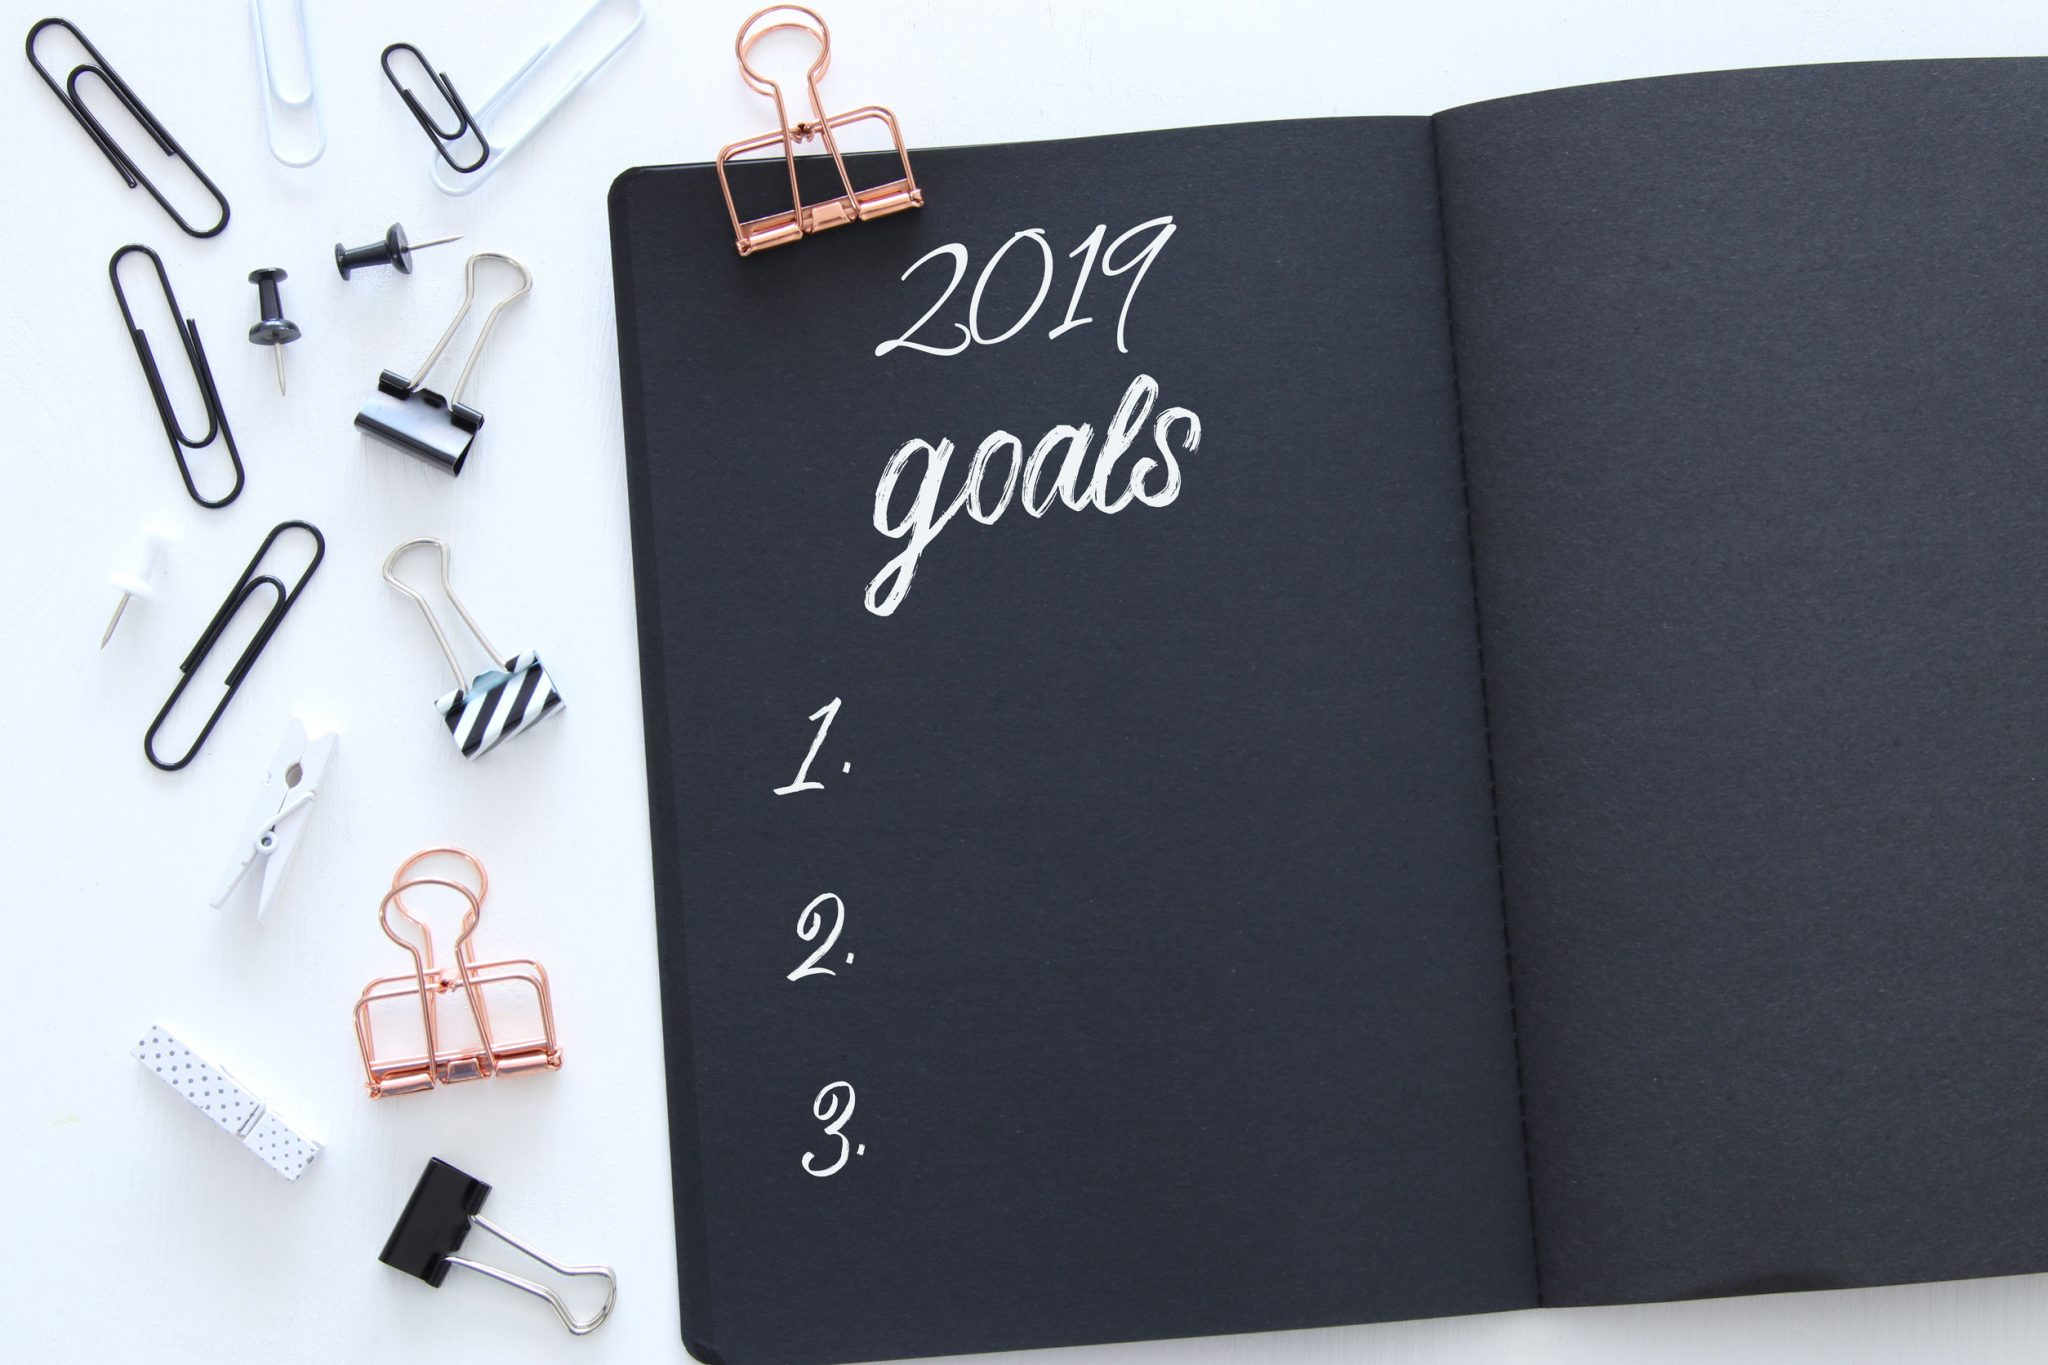 Digital Marketing Trends in 2019 - Eyler Creative